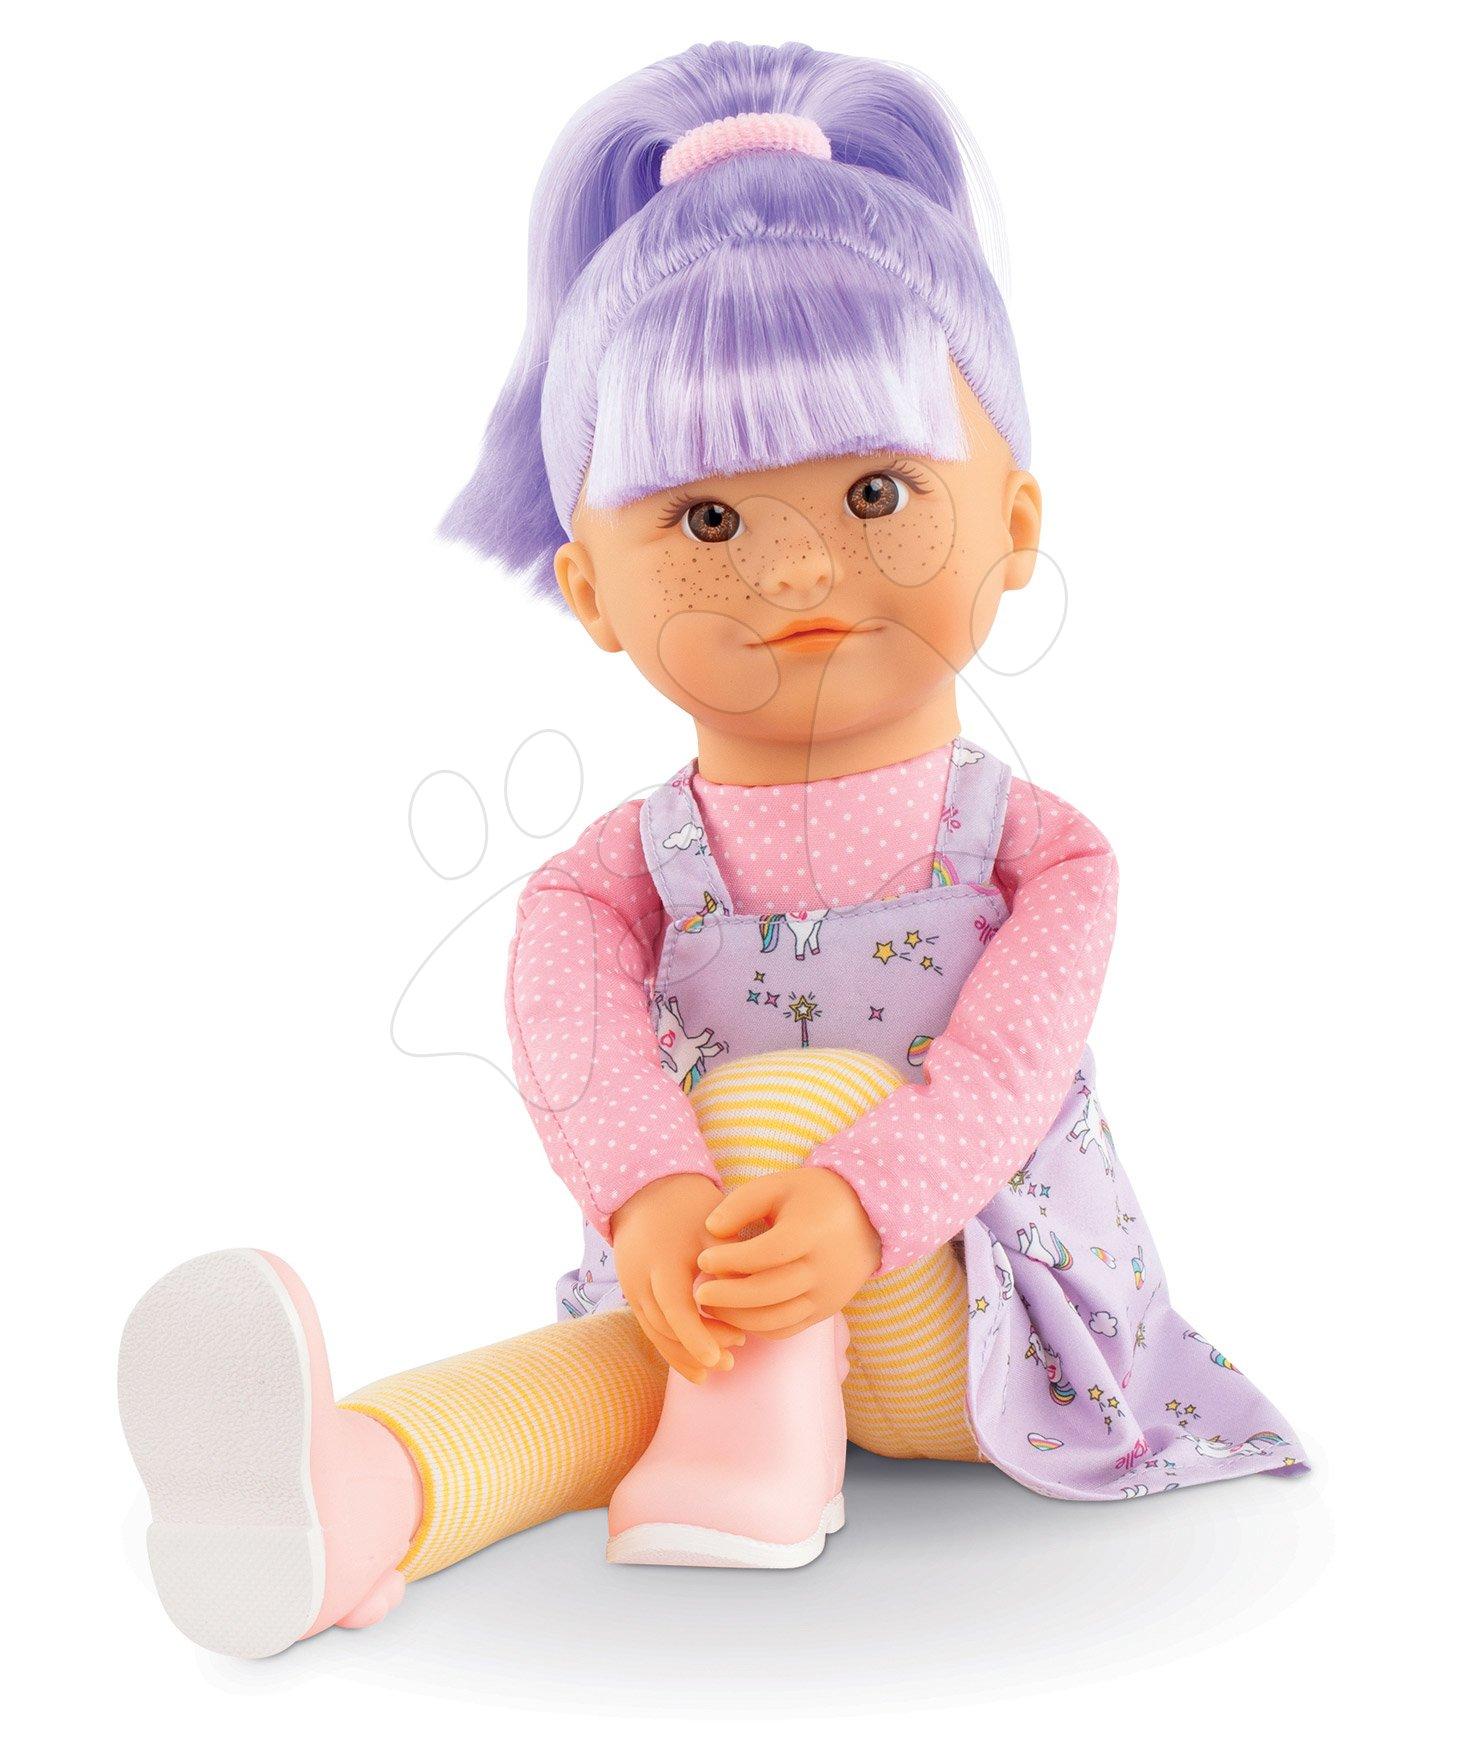 Bábika Iris Rainbow Dolls Corolle s hodvábnymi vlasmi a vanilkou fialová 38 cm od 3 rokov